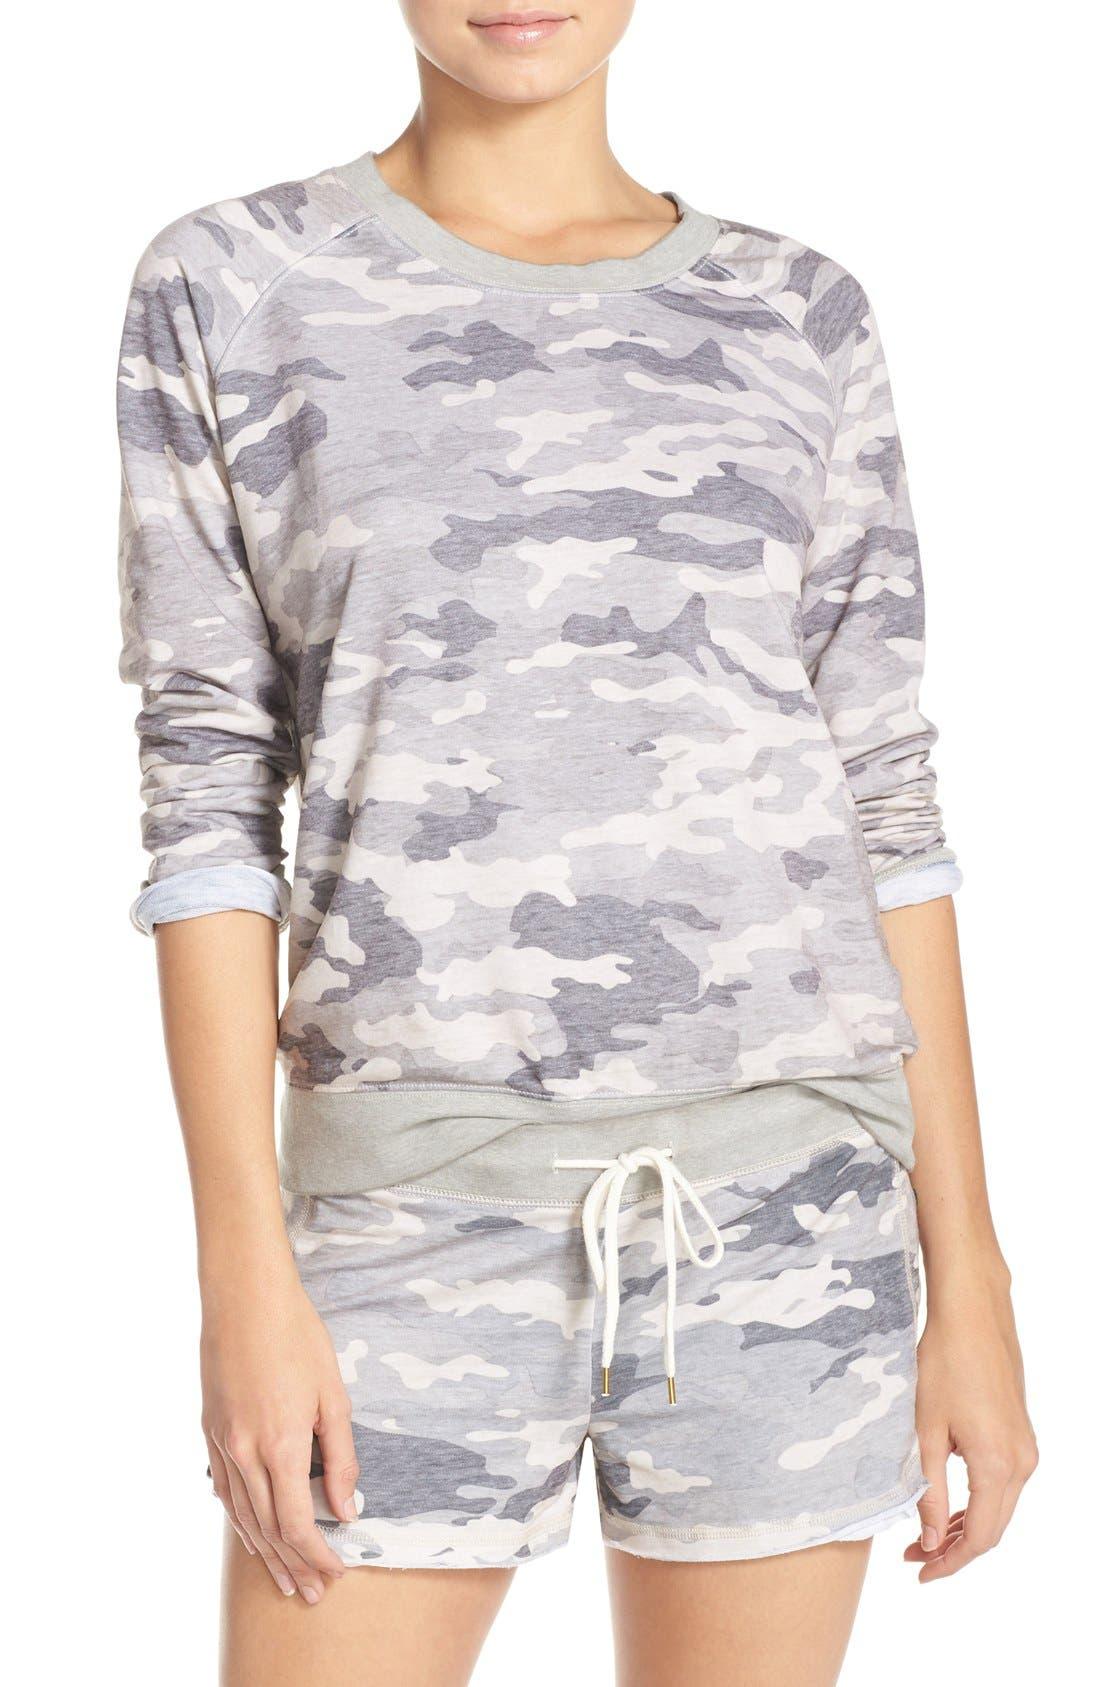 Alternate Image 1 Selected - Honeydew Intimates Burnout Lounge Sweatshirt